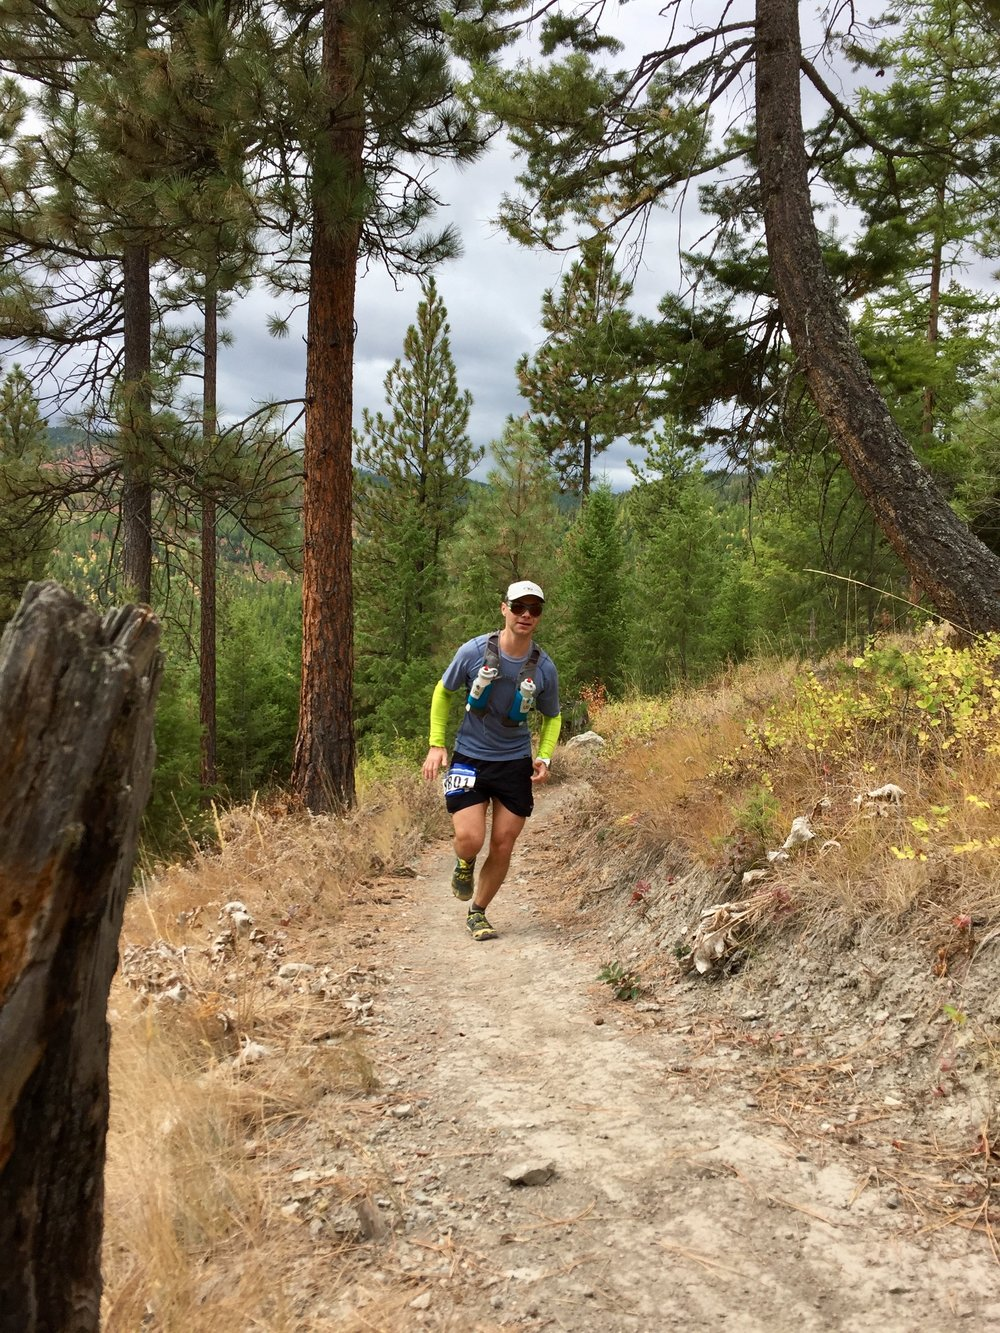 foys to blacktail trails trail marathon ftbtIMG_6623.JPG